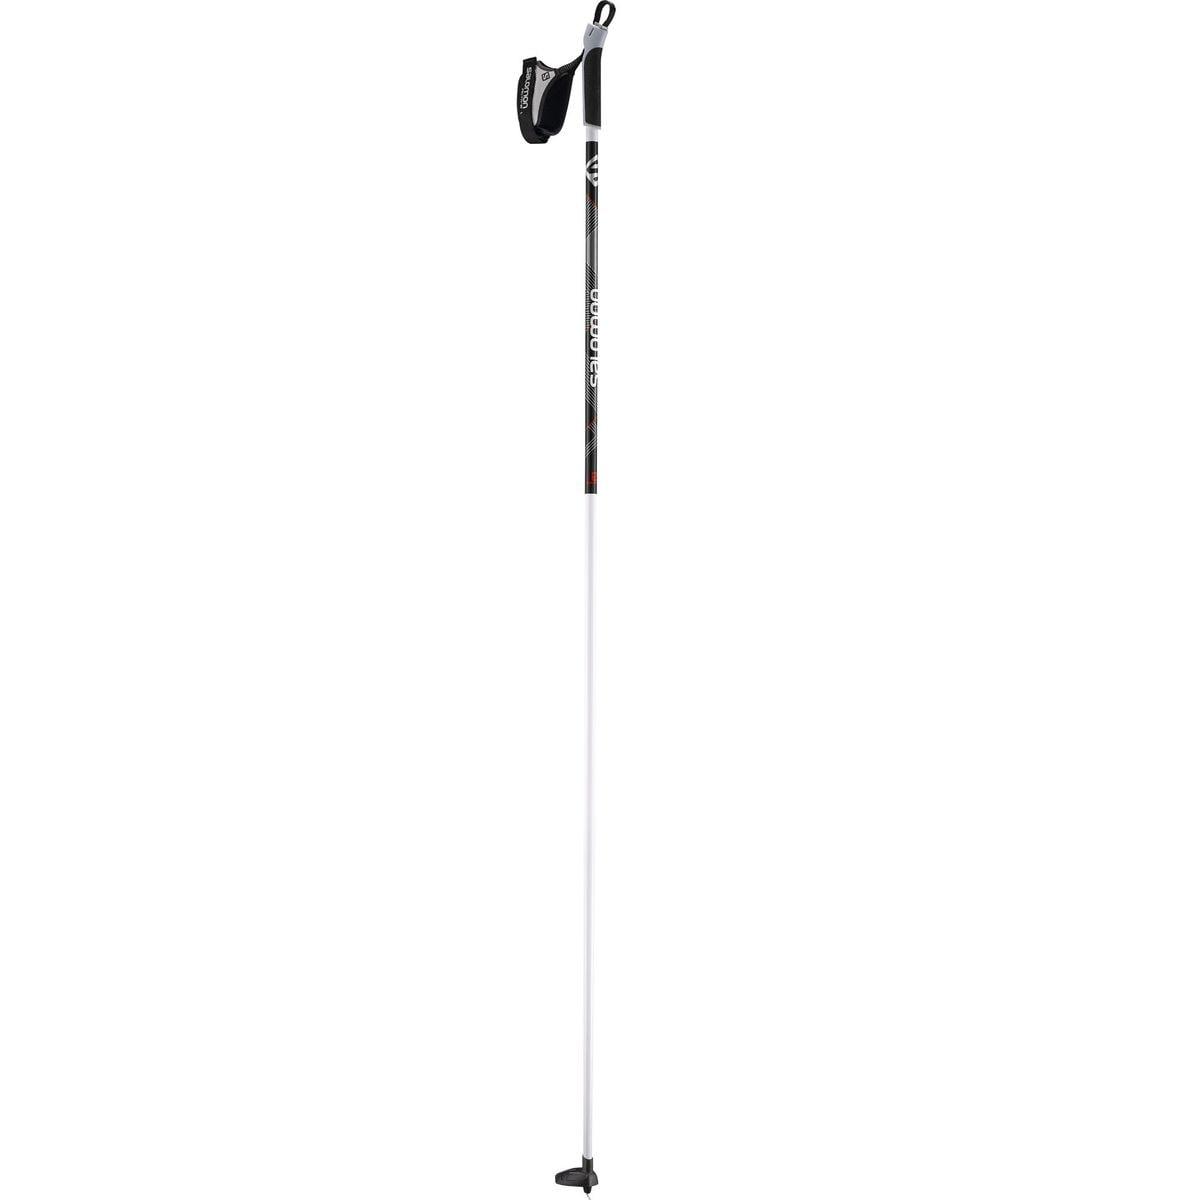 Salomon Active Ski Pole